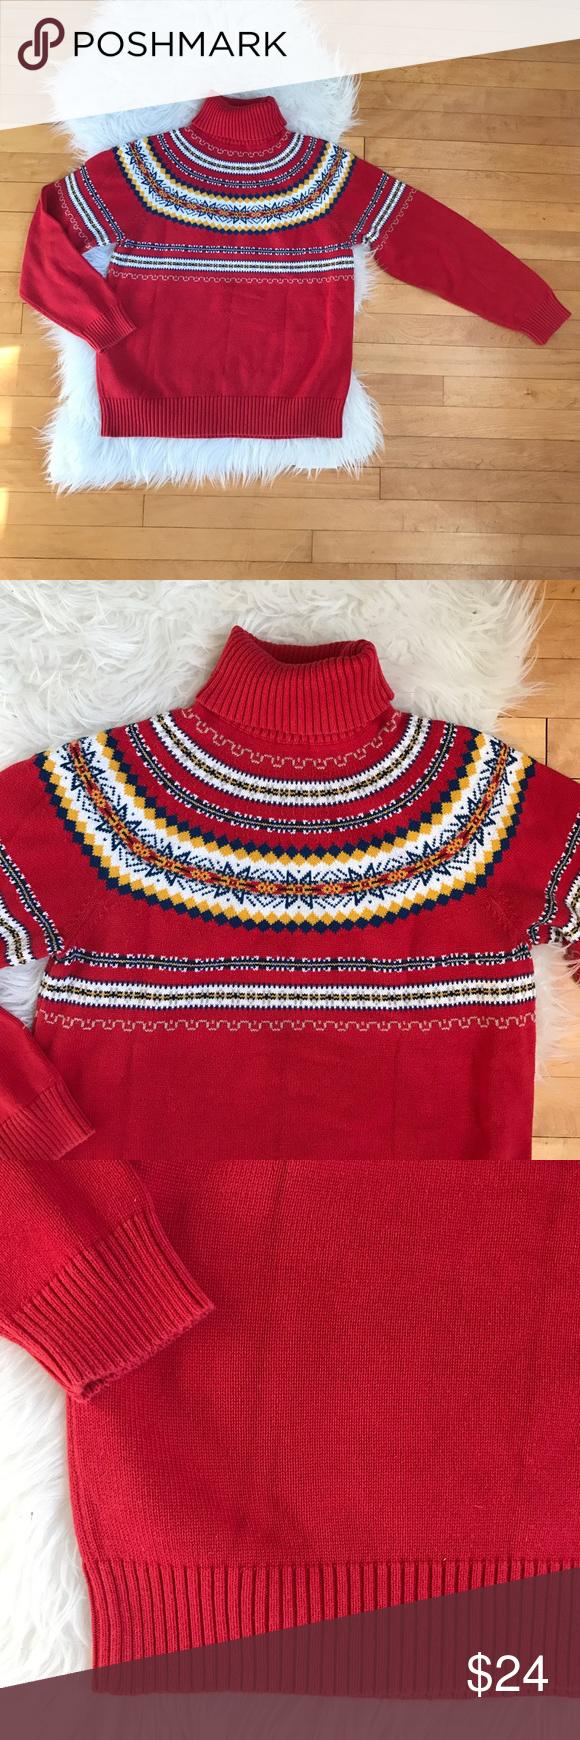 Pendleton Red Fair Isle Turtleneck Sweater P M